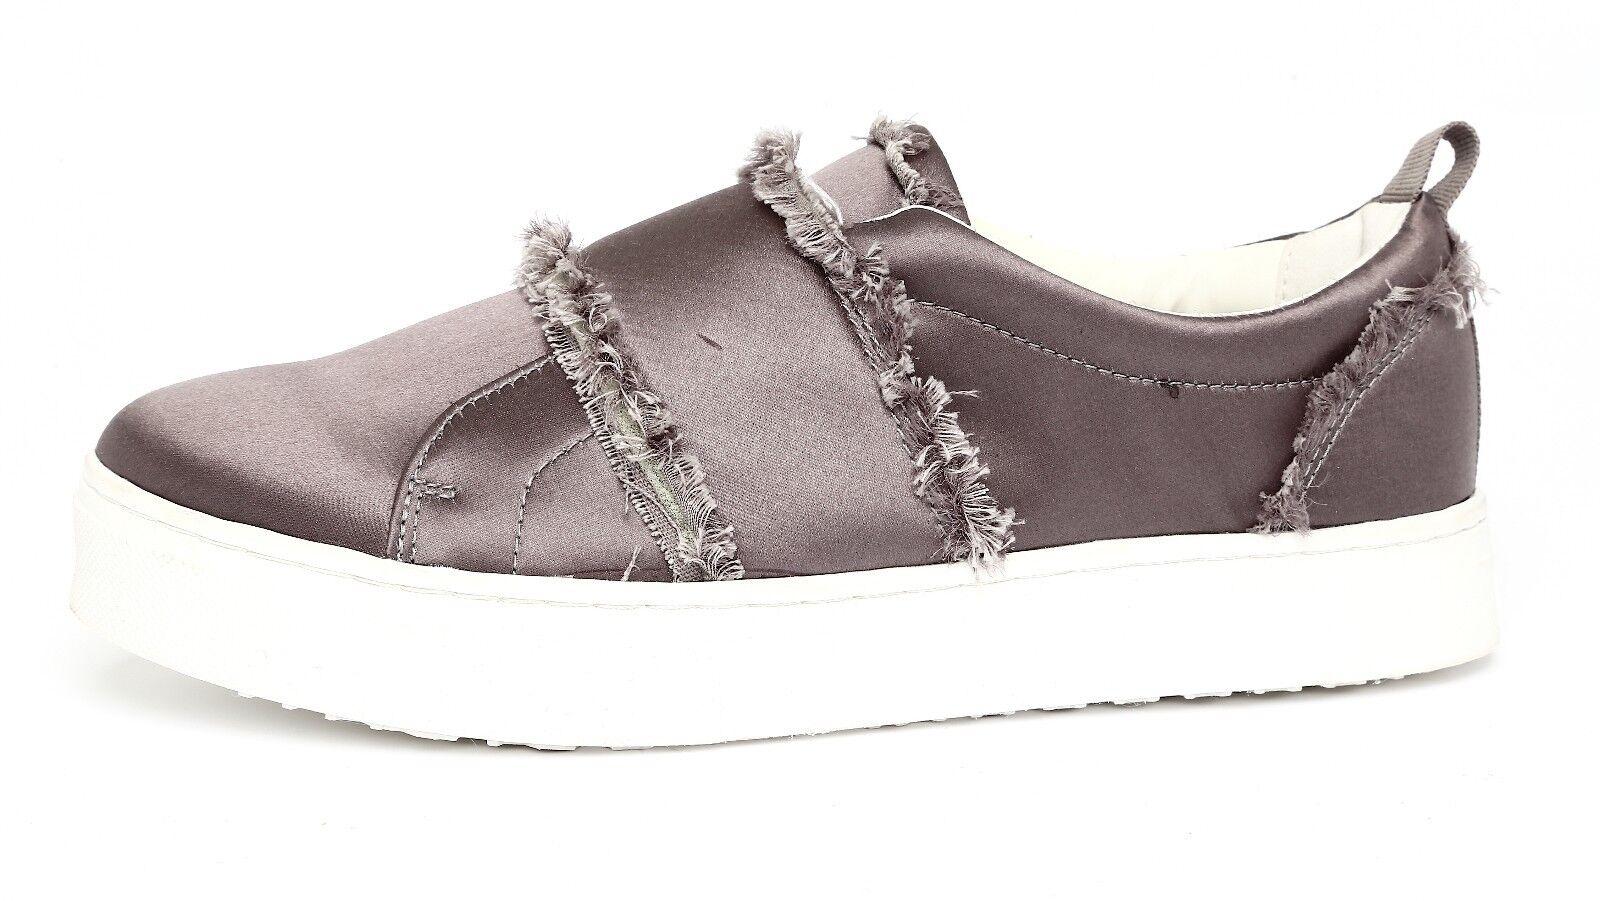 Sam Edelman Levine Womens Slip On Platform Sneakers Sz 9.5M 4225